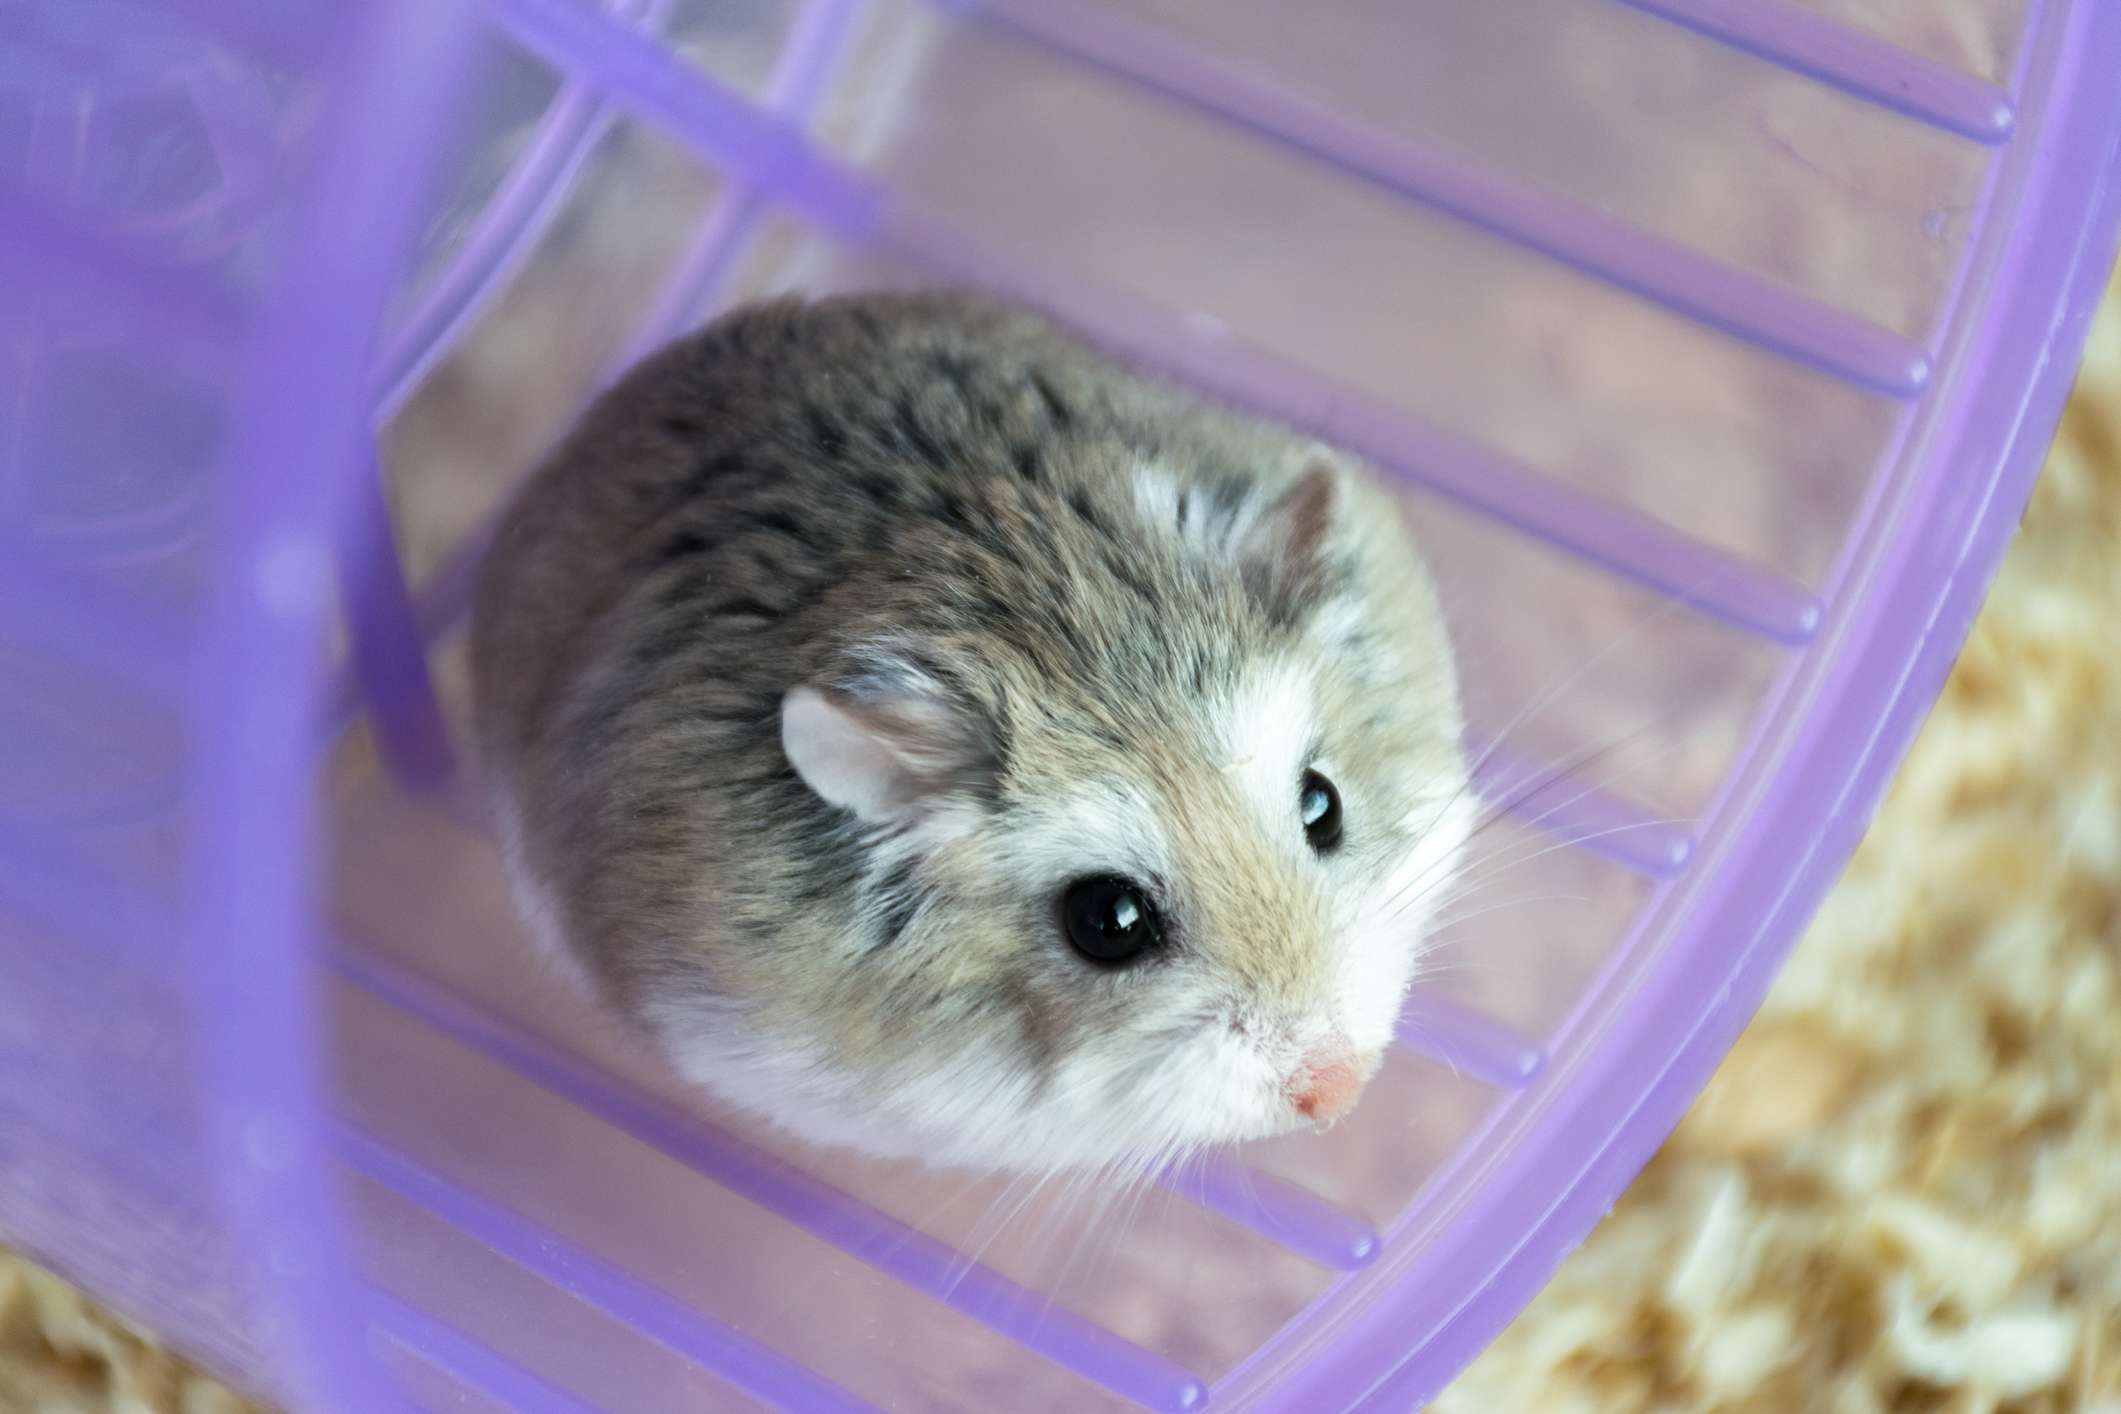 Dwarf Roborovski (Phodopus roborovski) hamster on wheel